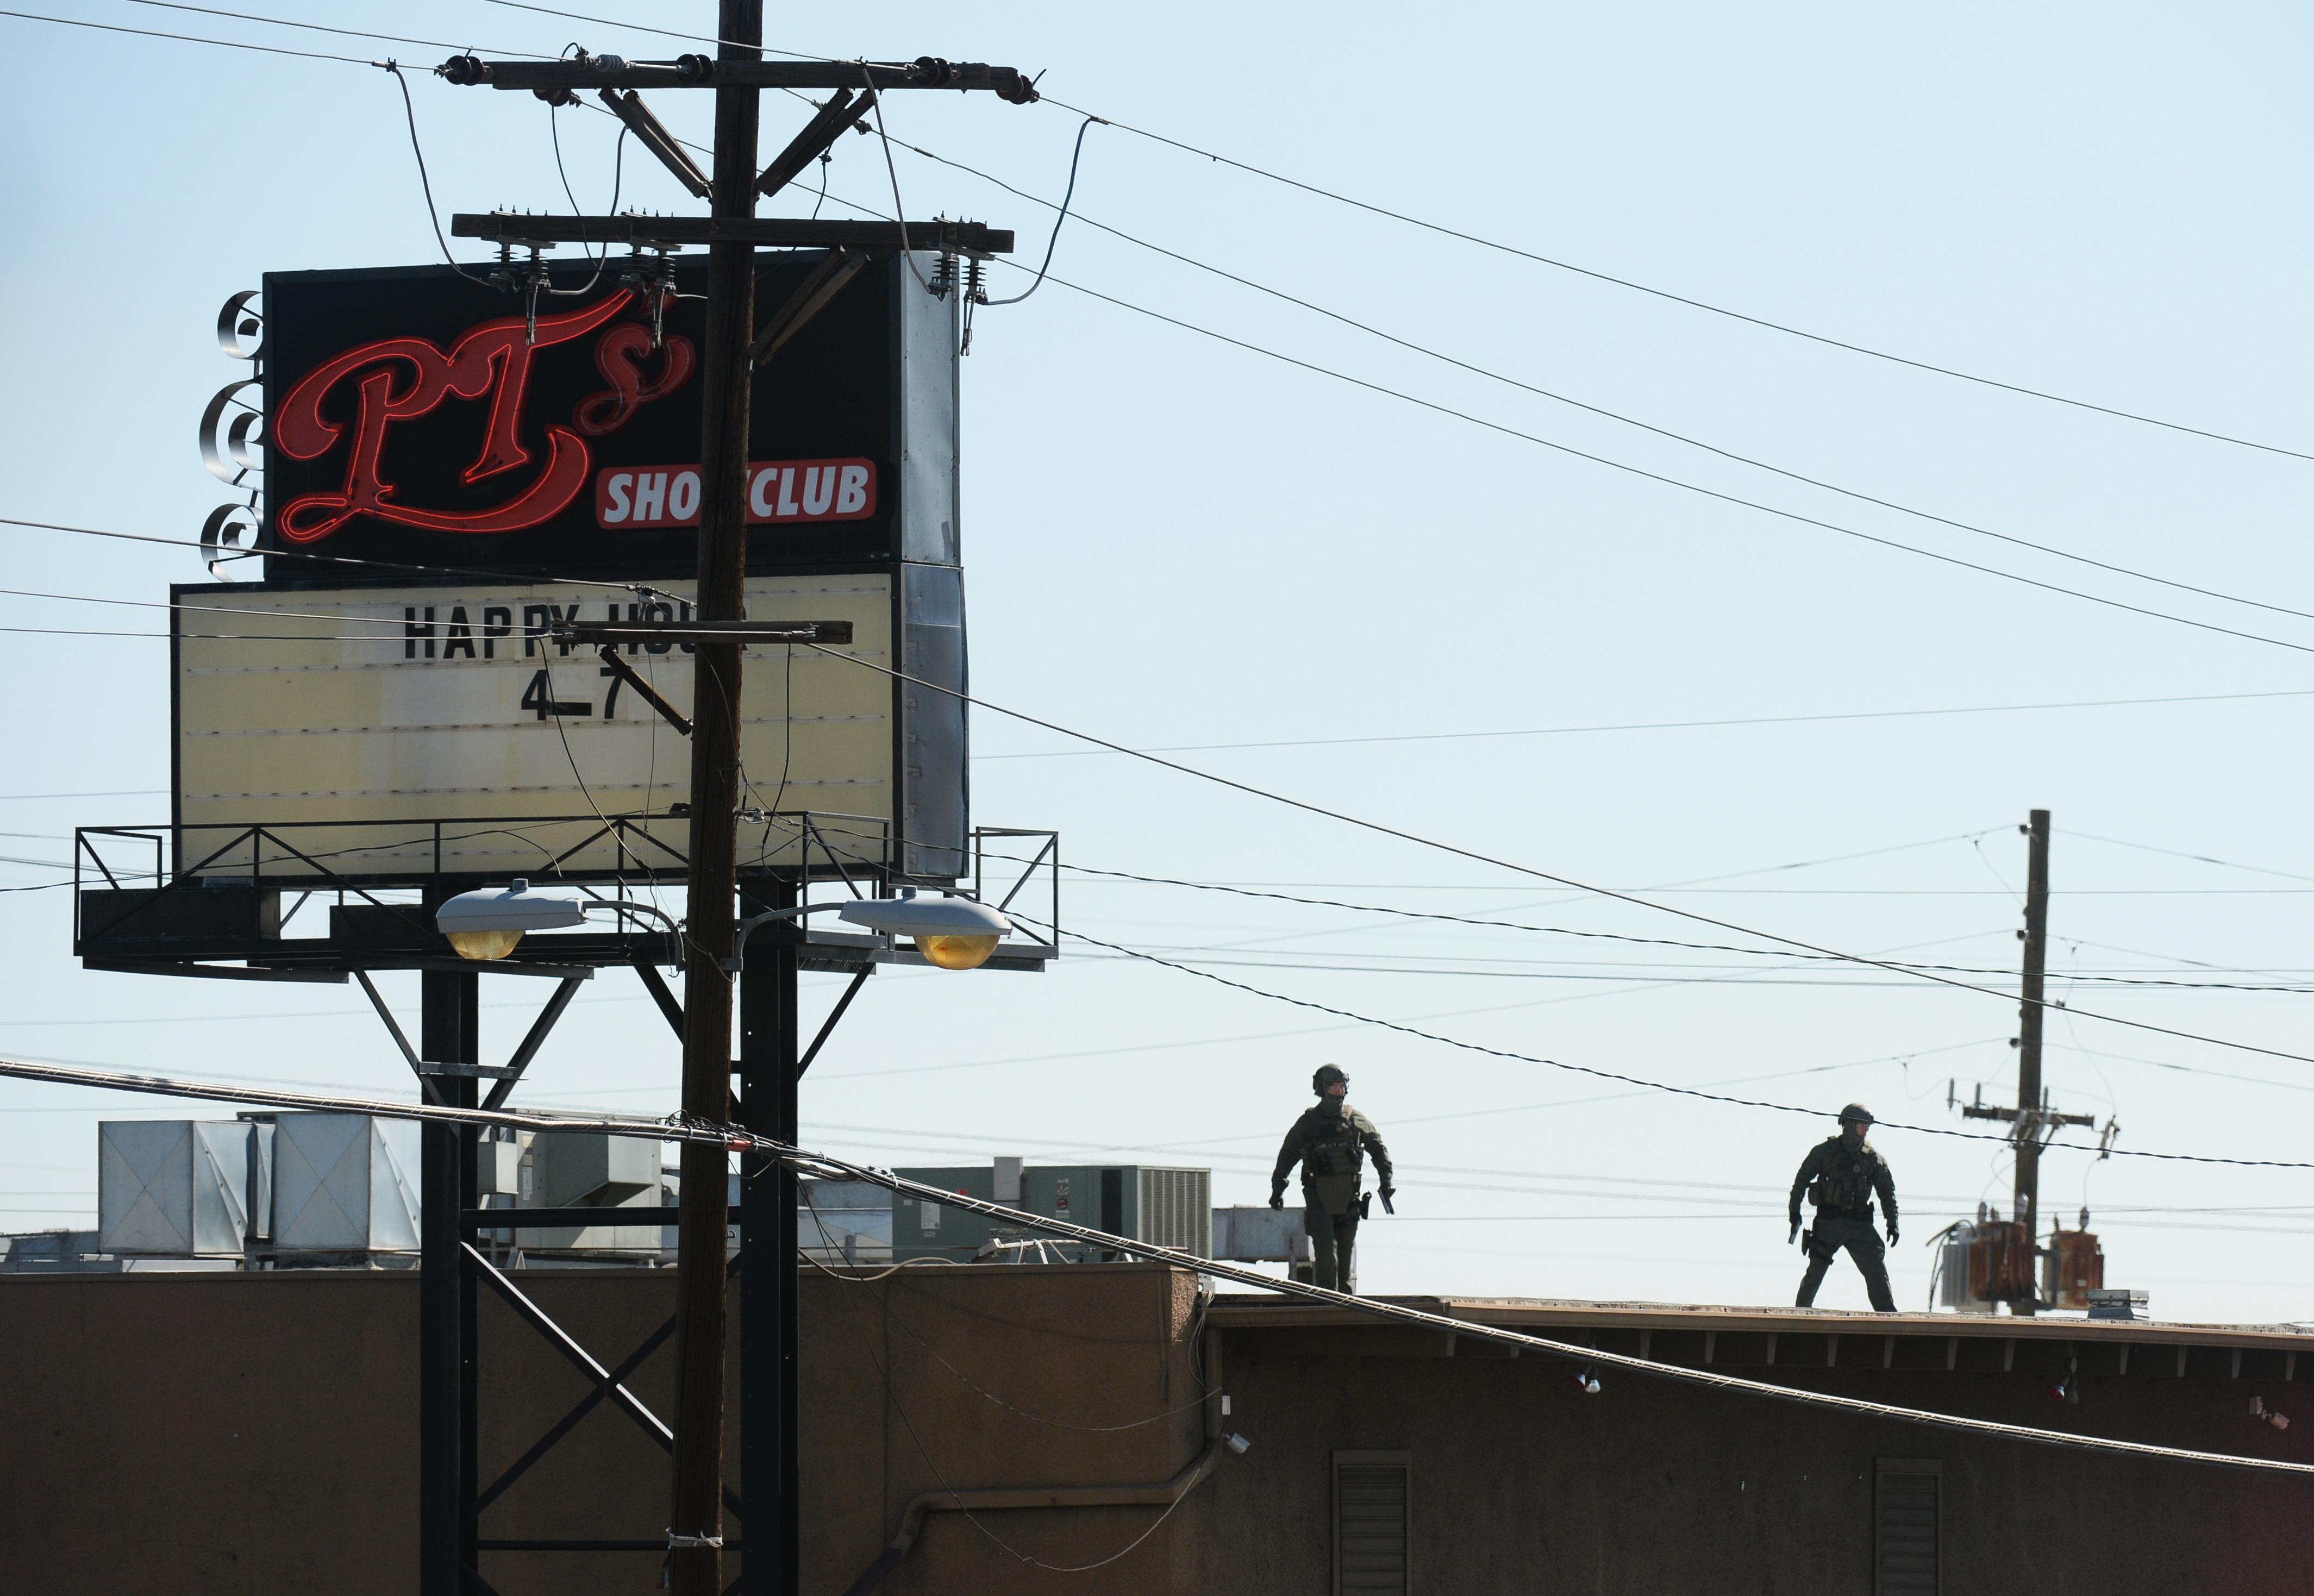 Denver police clear the scene outside of PT's Showclub